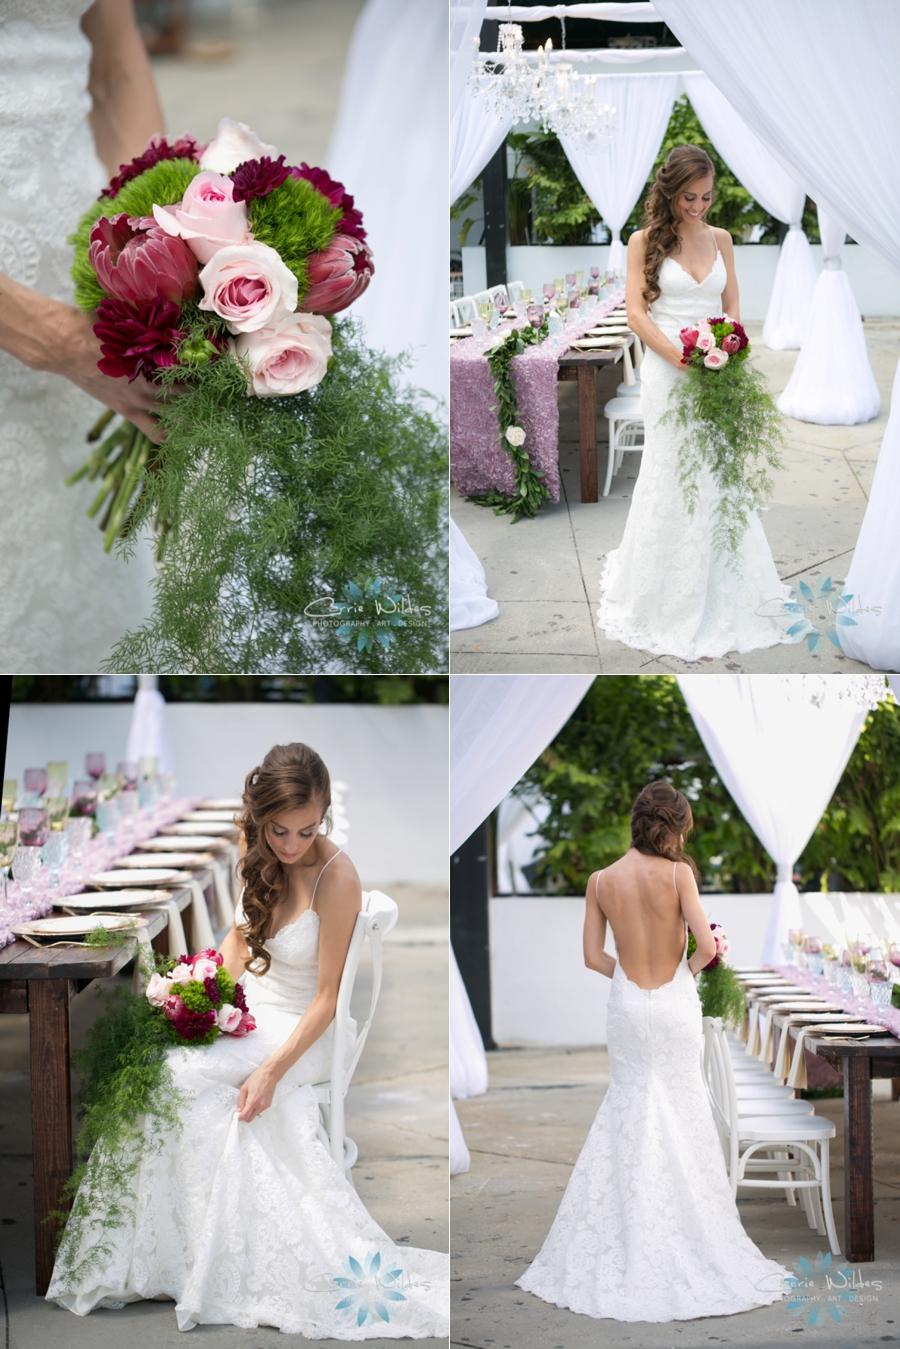 9_8_16 Ivy Astoria Ybor City Weddings_0012.jpg